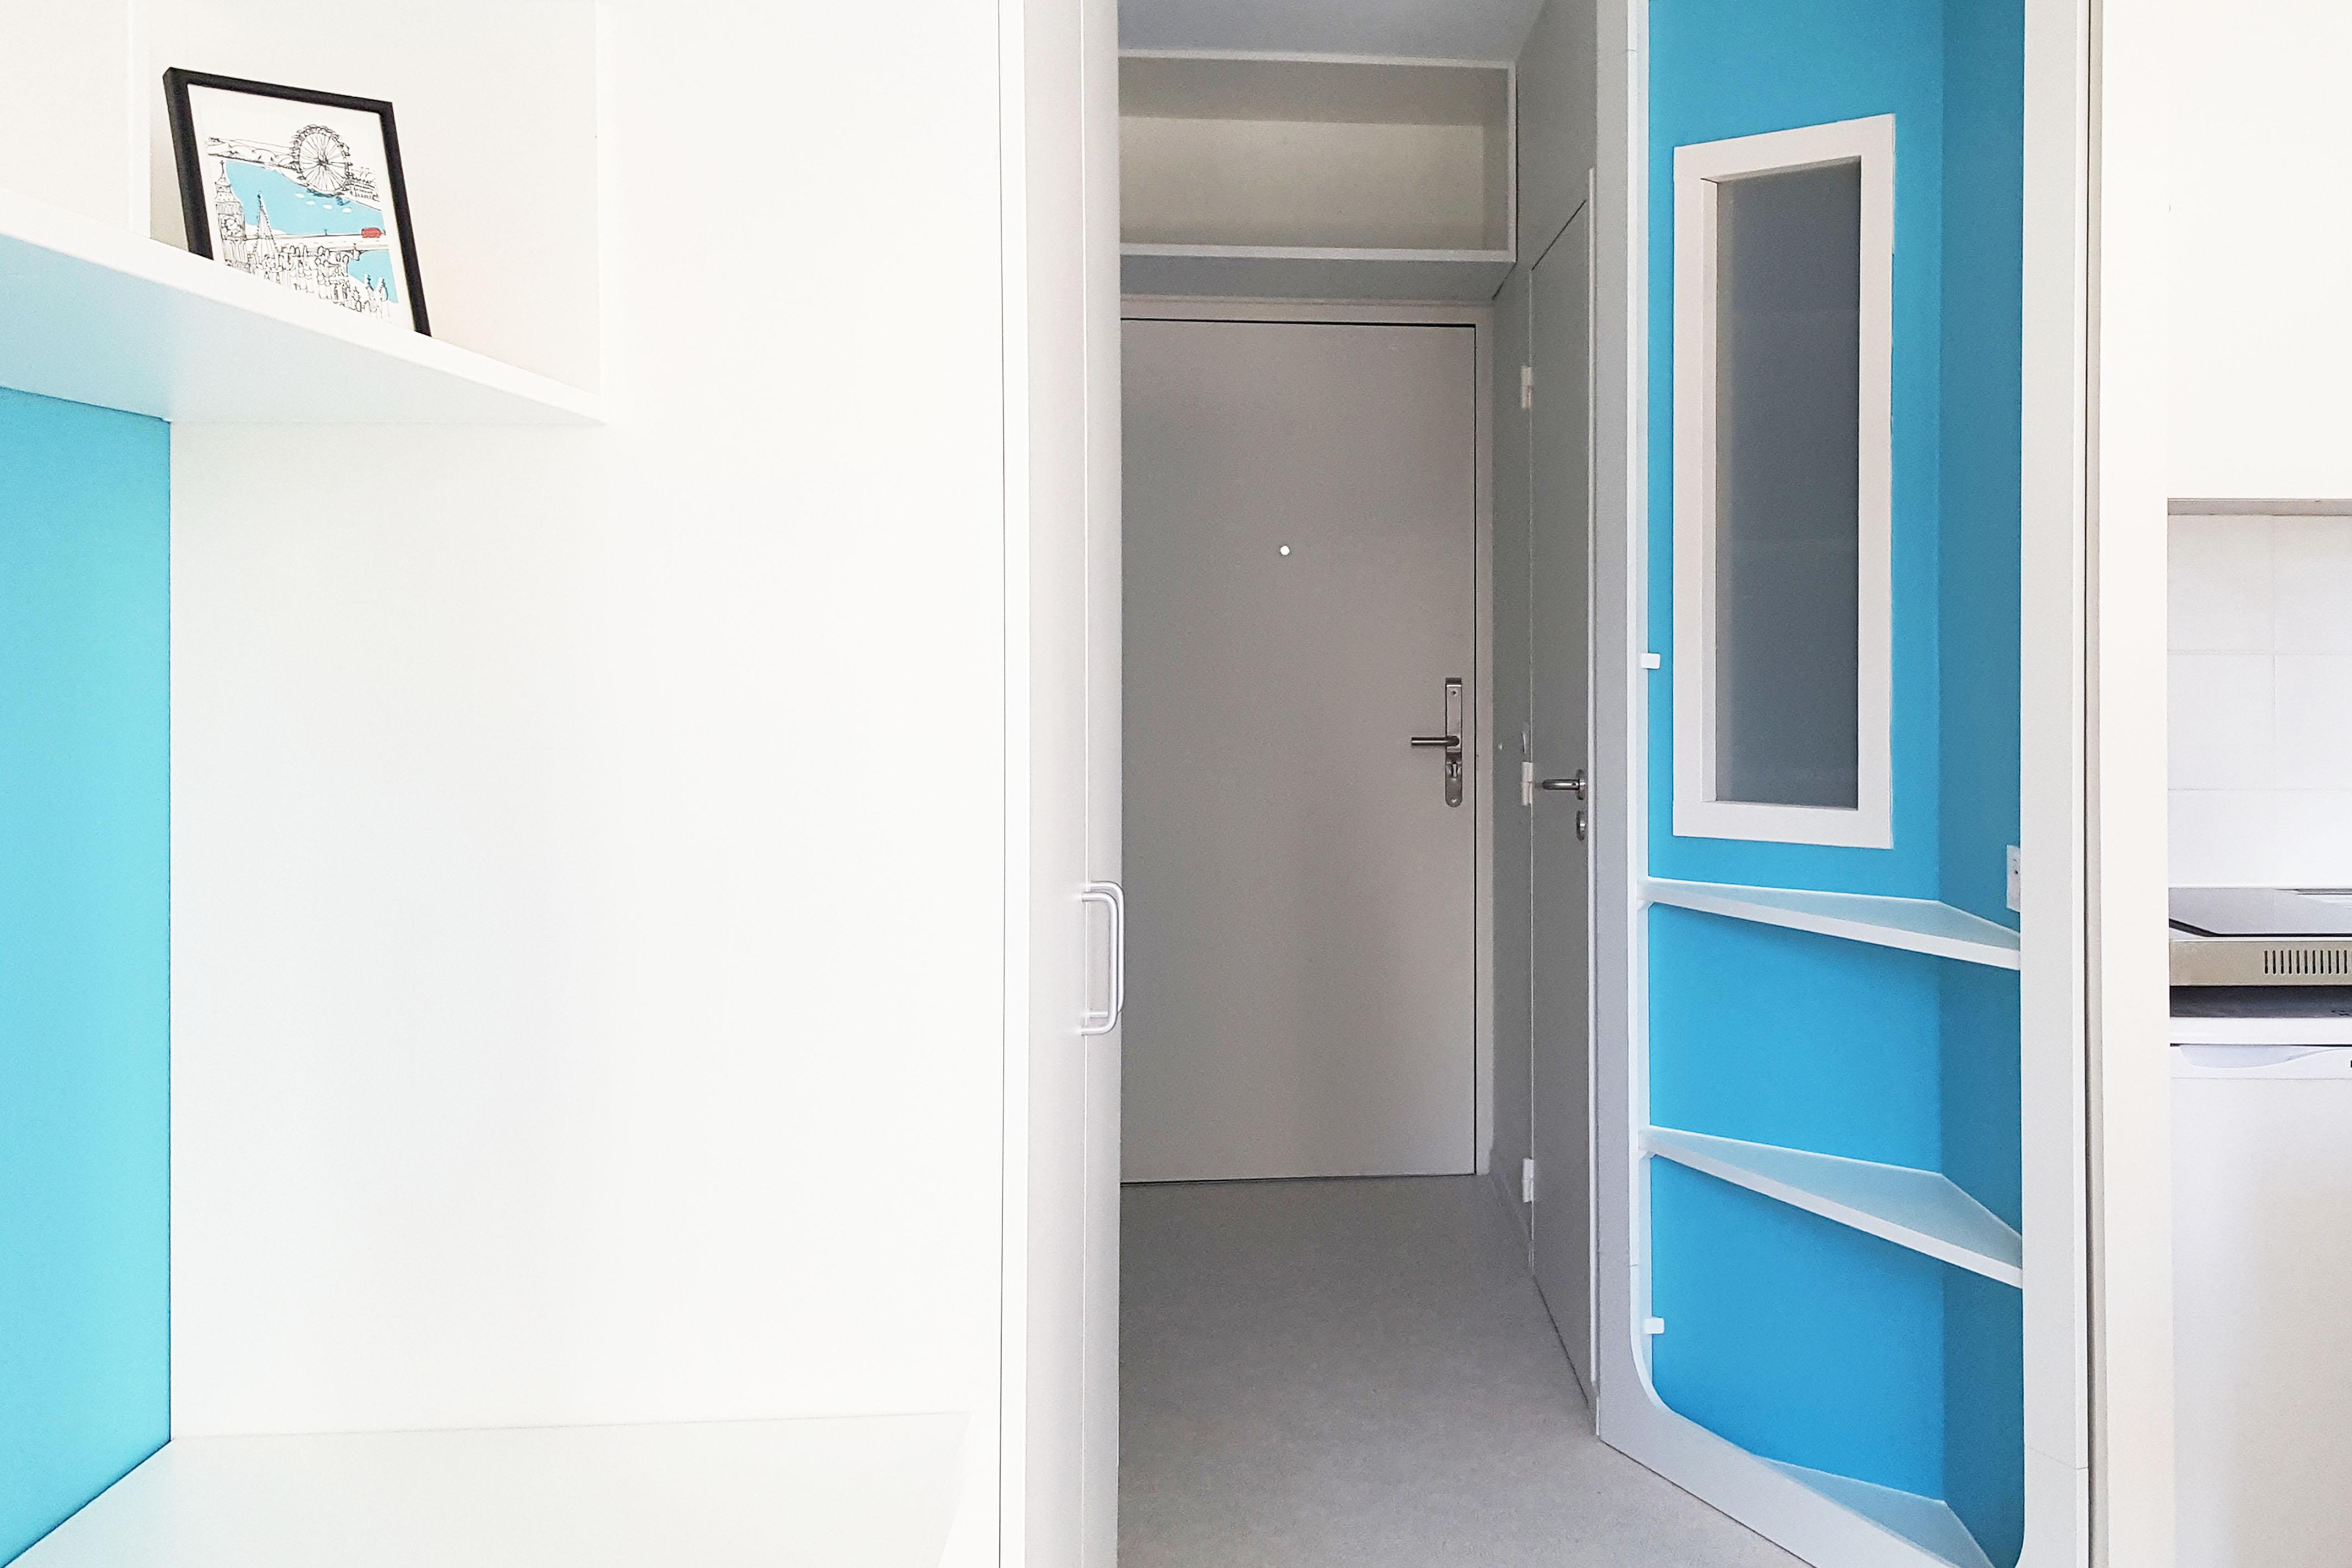 agencement-résidence-universitaire-crous-lyon-agence-baltys-02